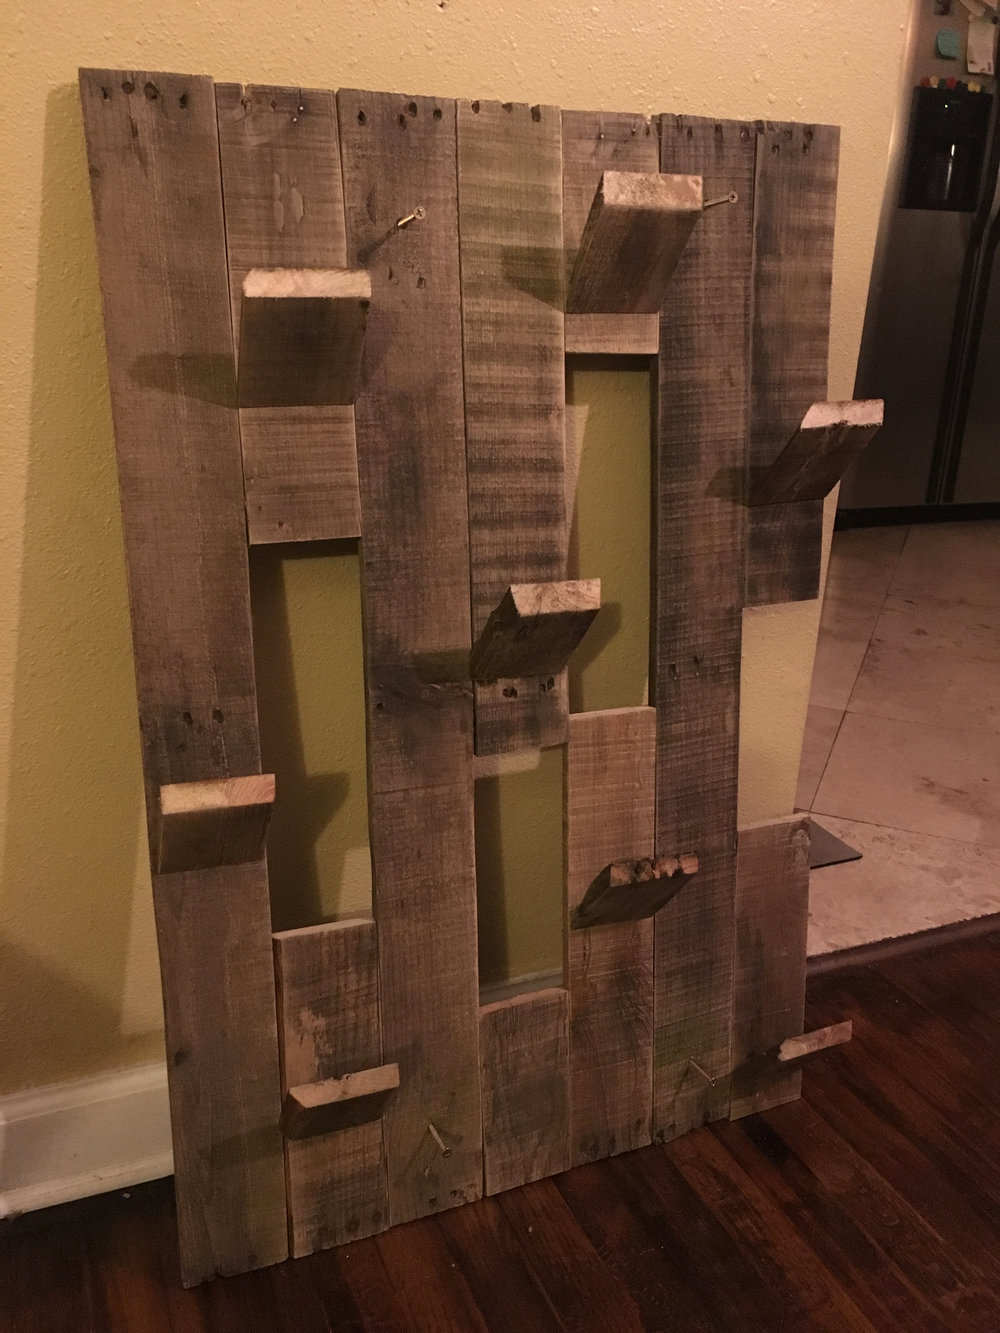 8 Bottle Wall Wine Holder - Pallet Wood